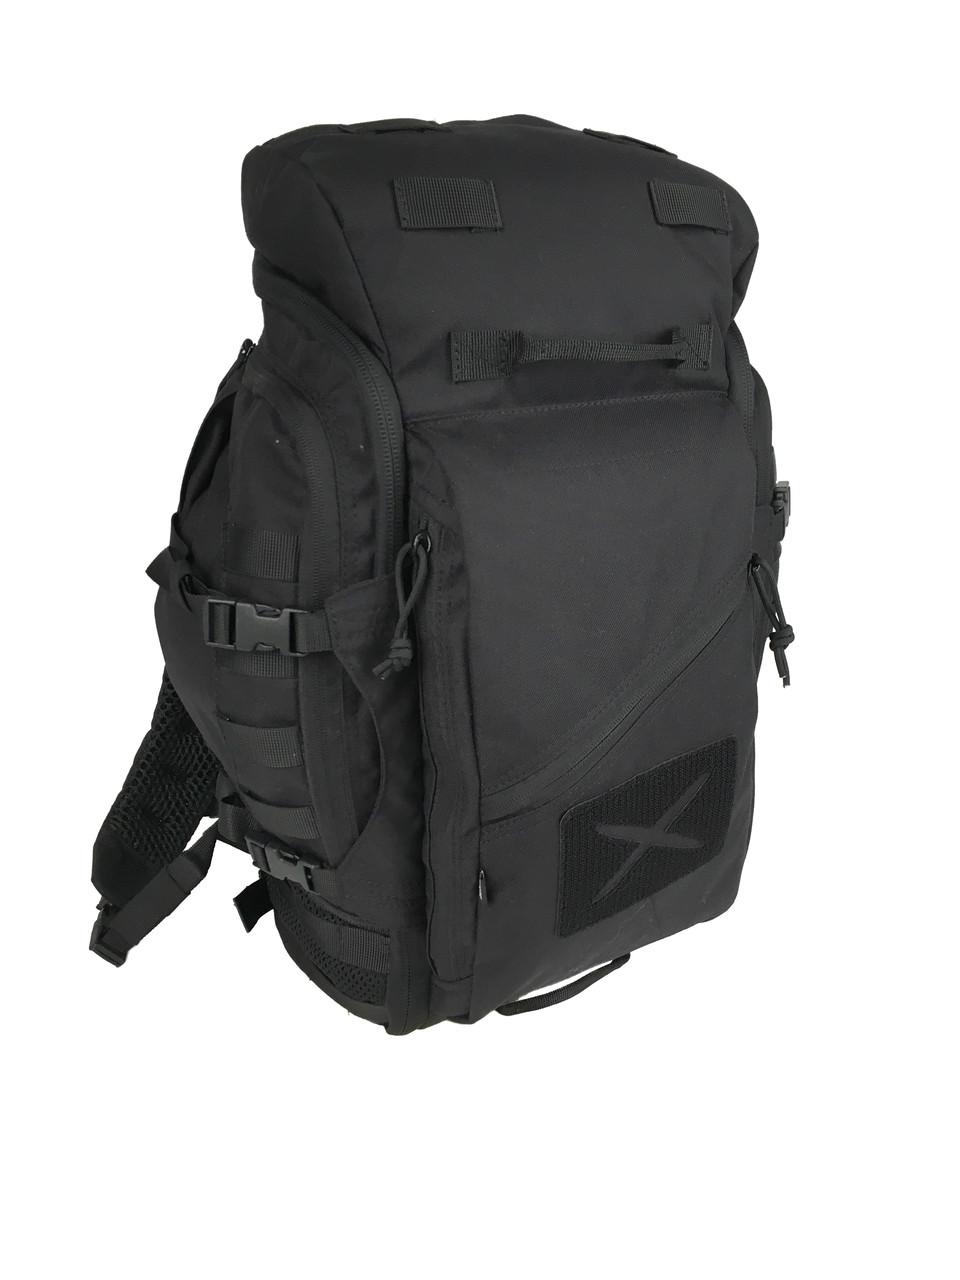 Тактический рюкзак ПК-S Черний